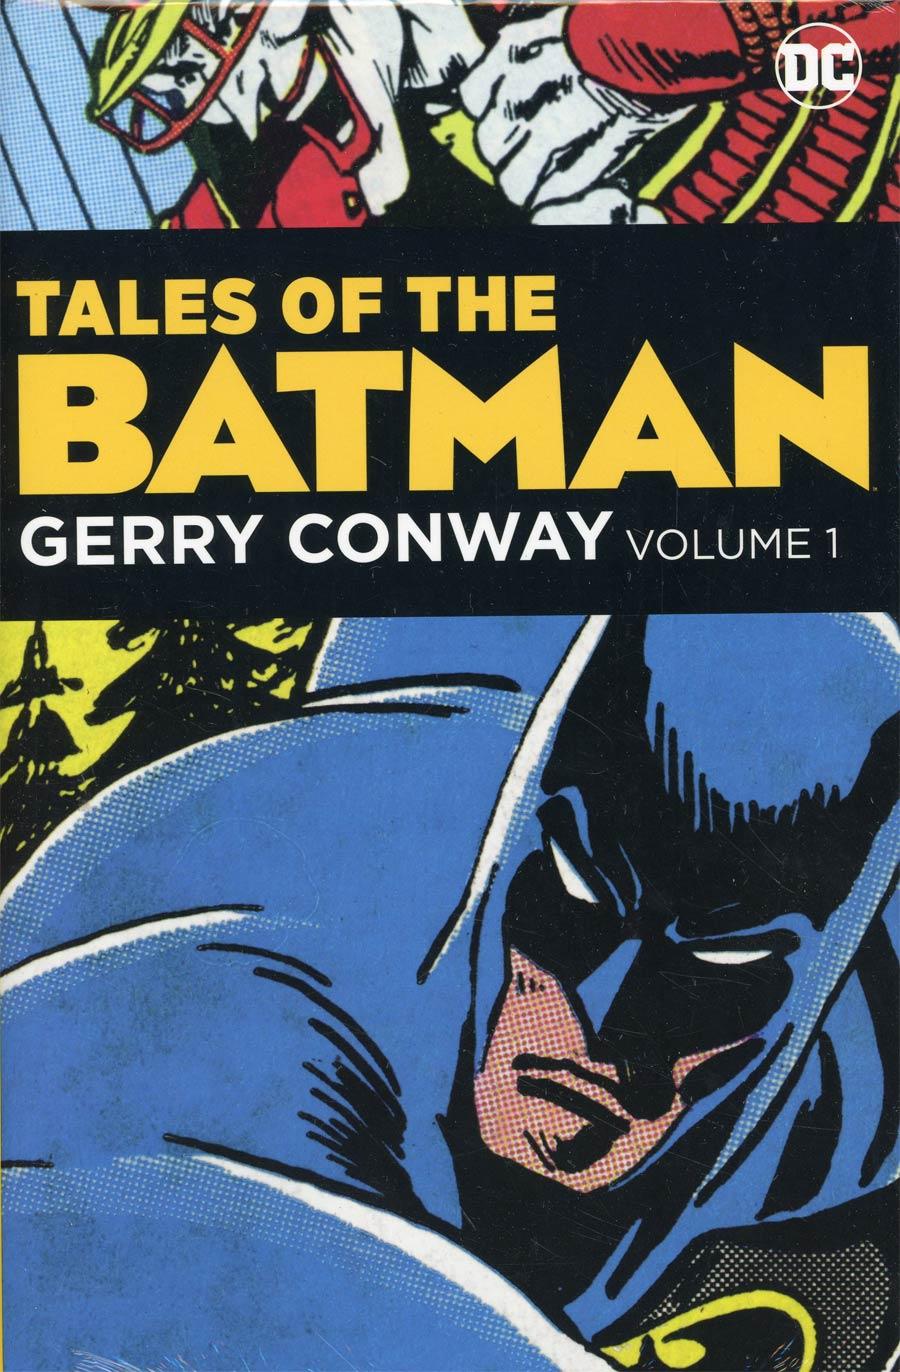 Tales Of The Batman Gerry Conway Vol 1 HC